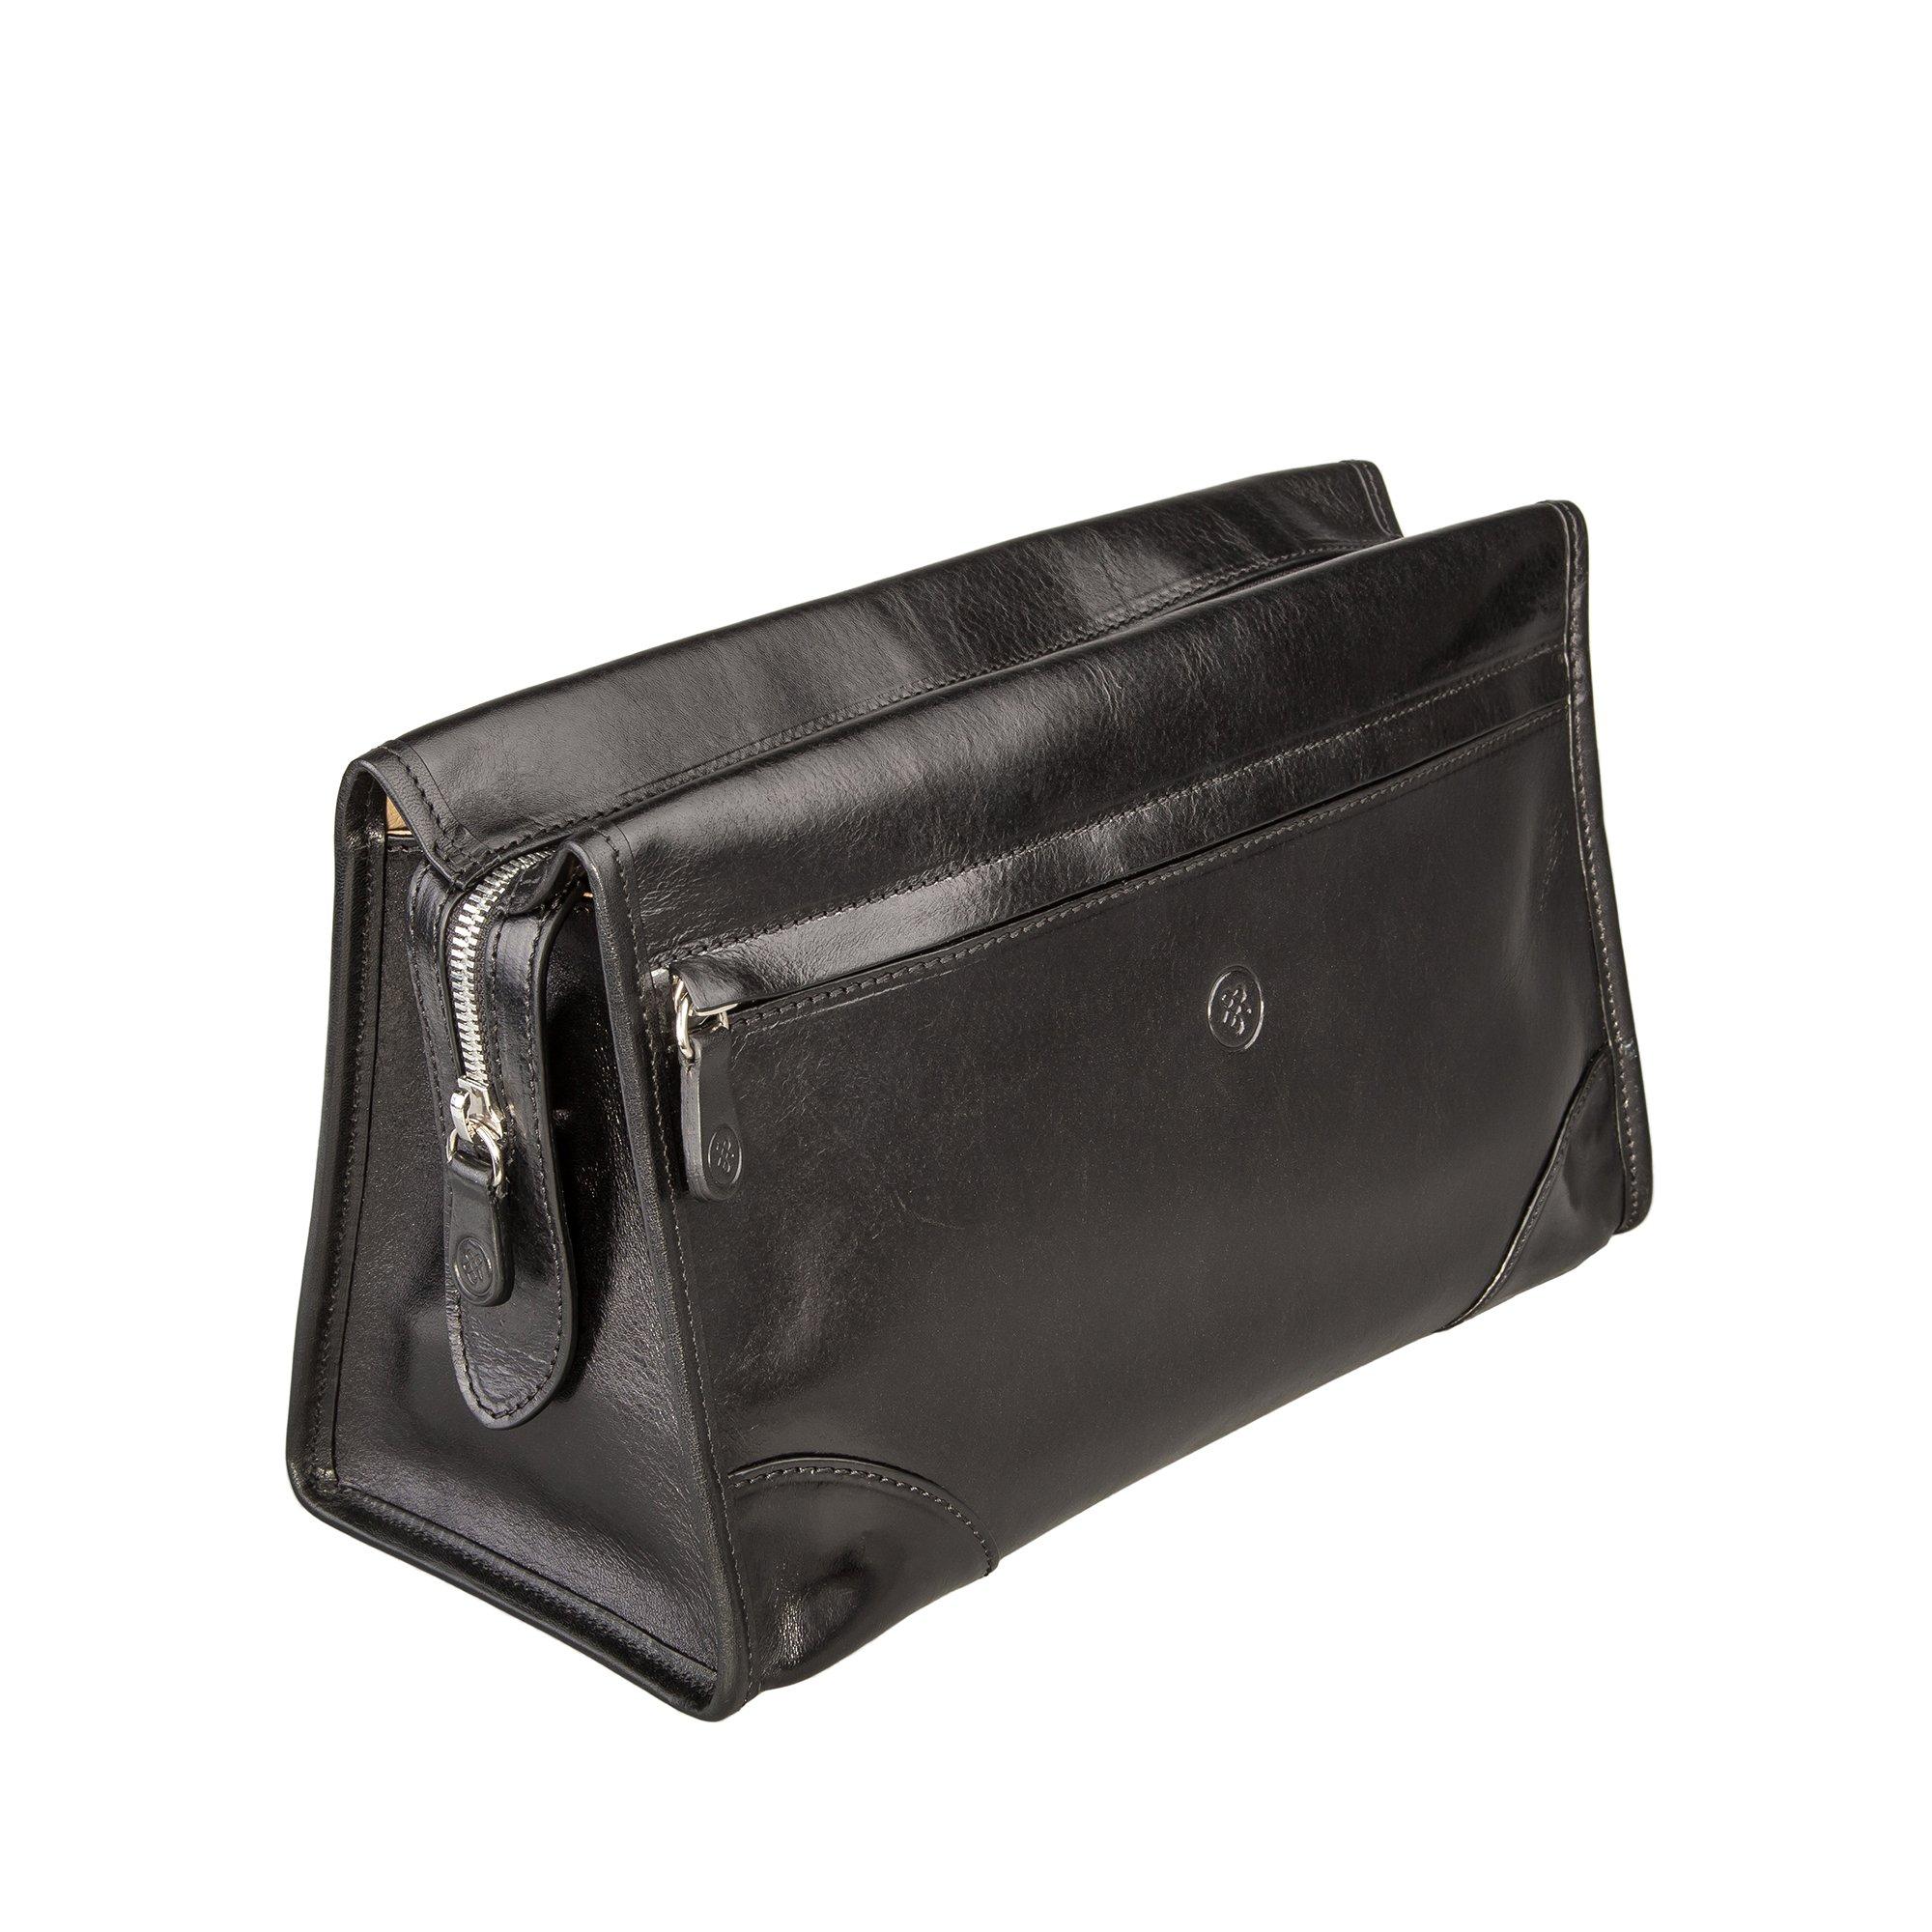 Maxwell Scott Maxwell Scott Luxury Black Leather Dopp Kit (The Tanta) - One Size